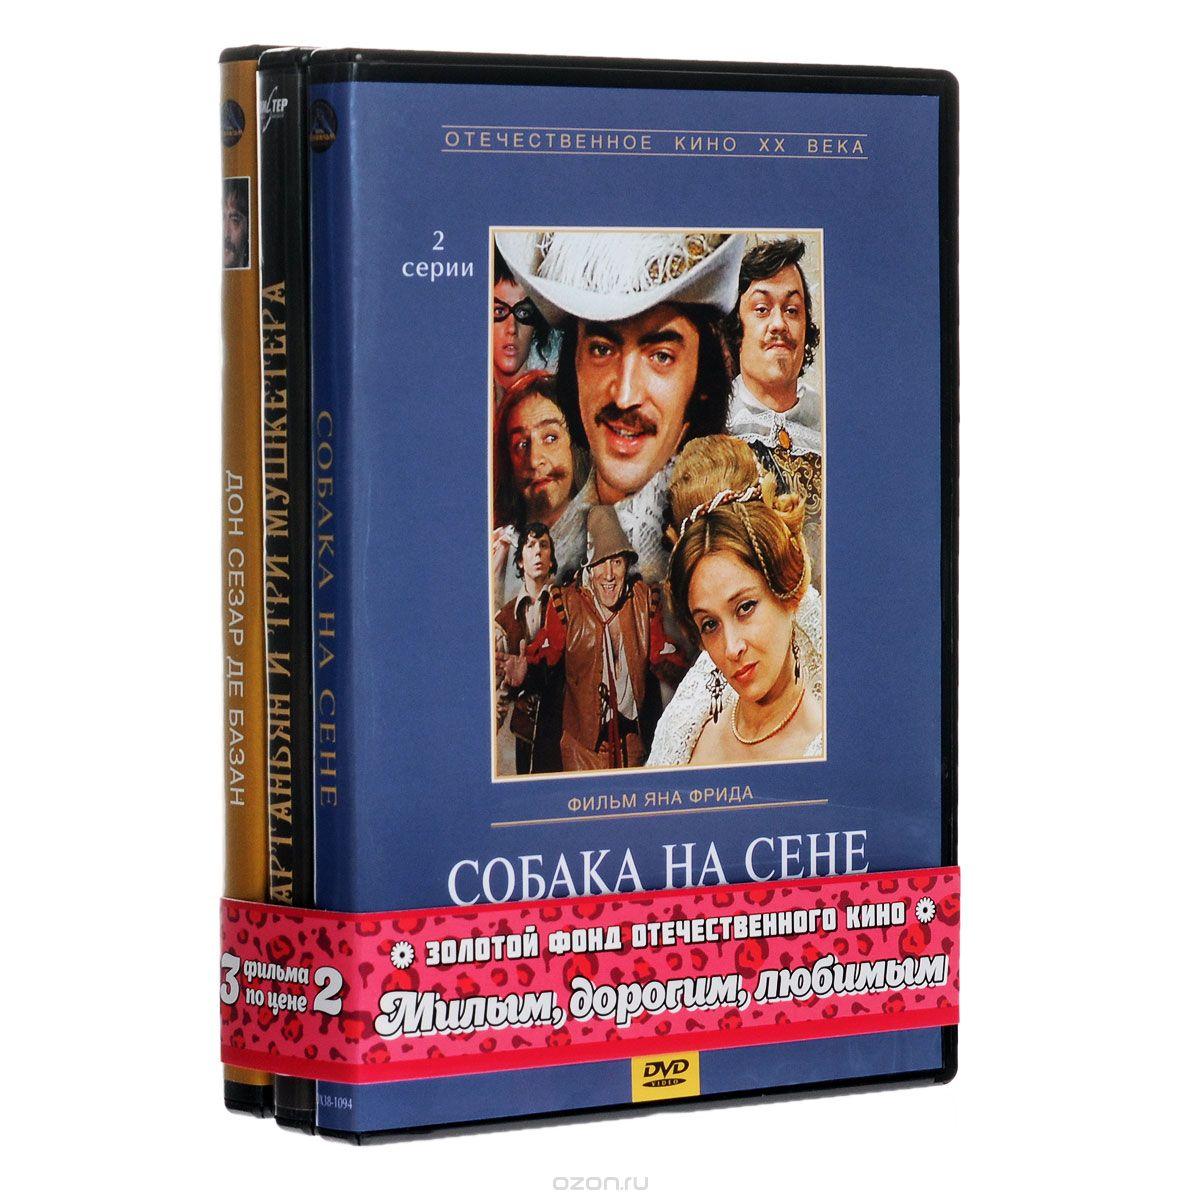 Милым, дорогим, любимым: Д'Артаньян и три мушкетера. 1-3 серии / Дон Сезар де Базан. 1-2 серии / Собака на сене. 1-2 серии (3 DVD)